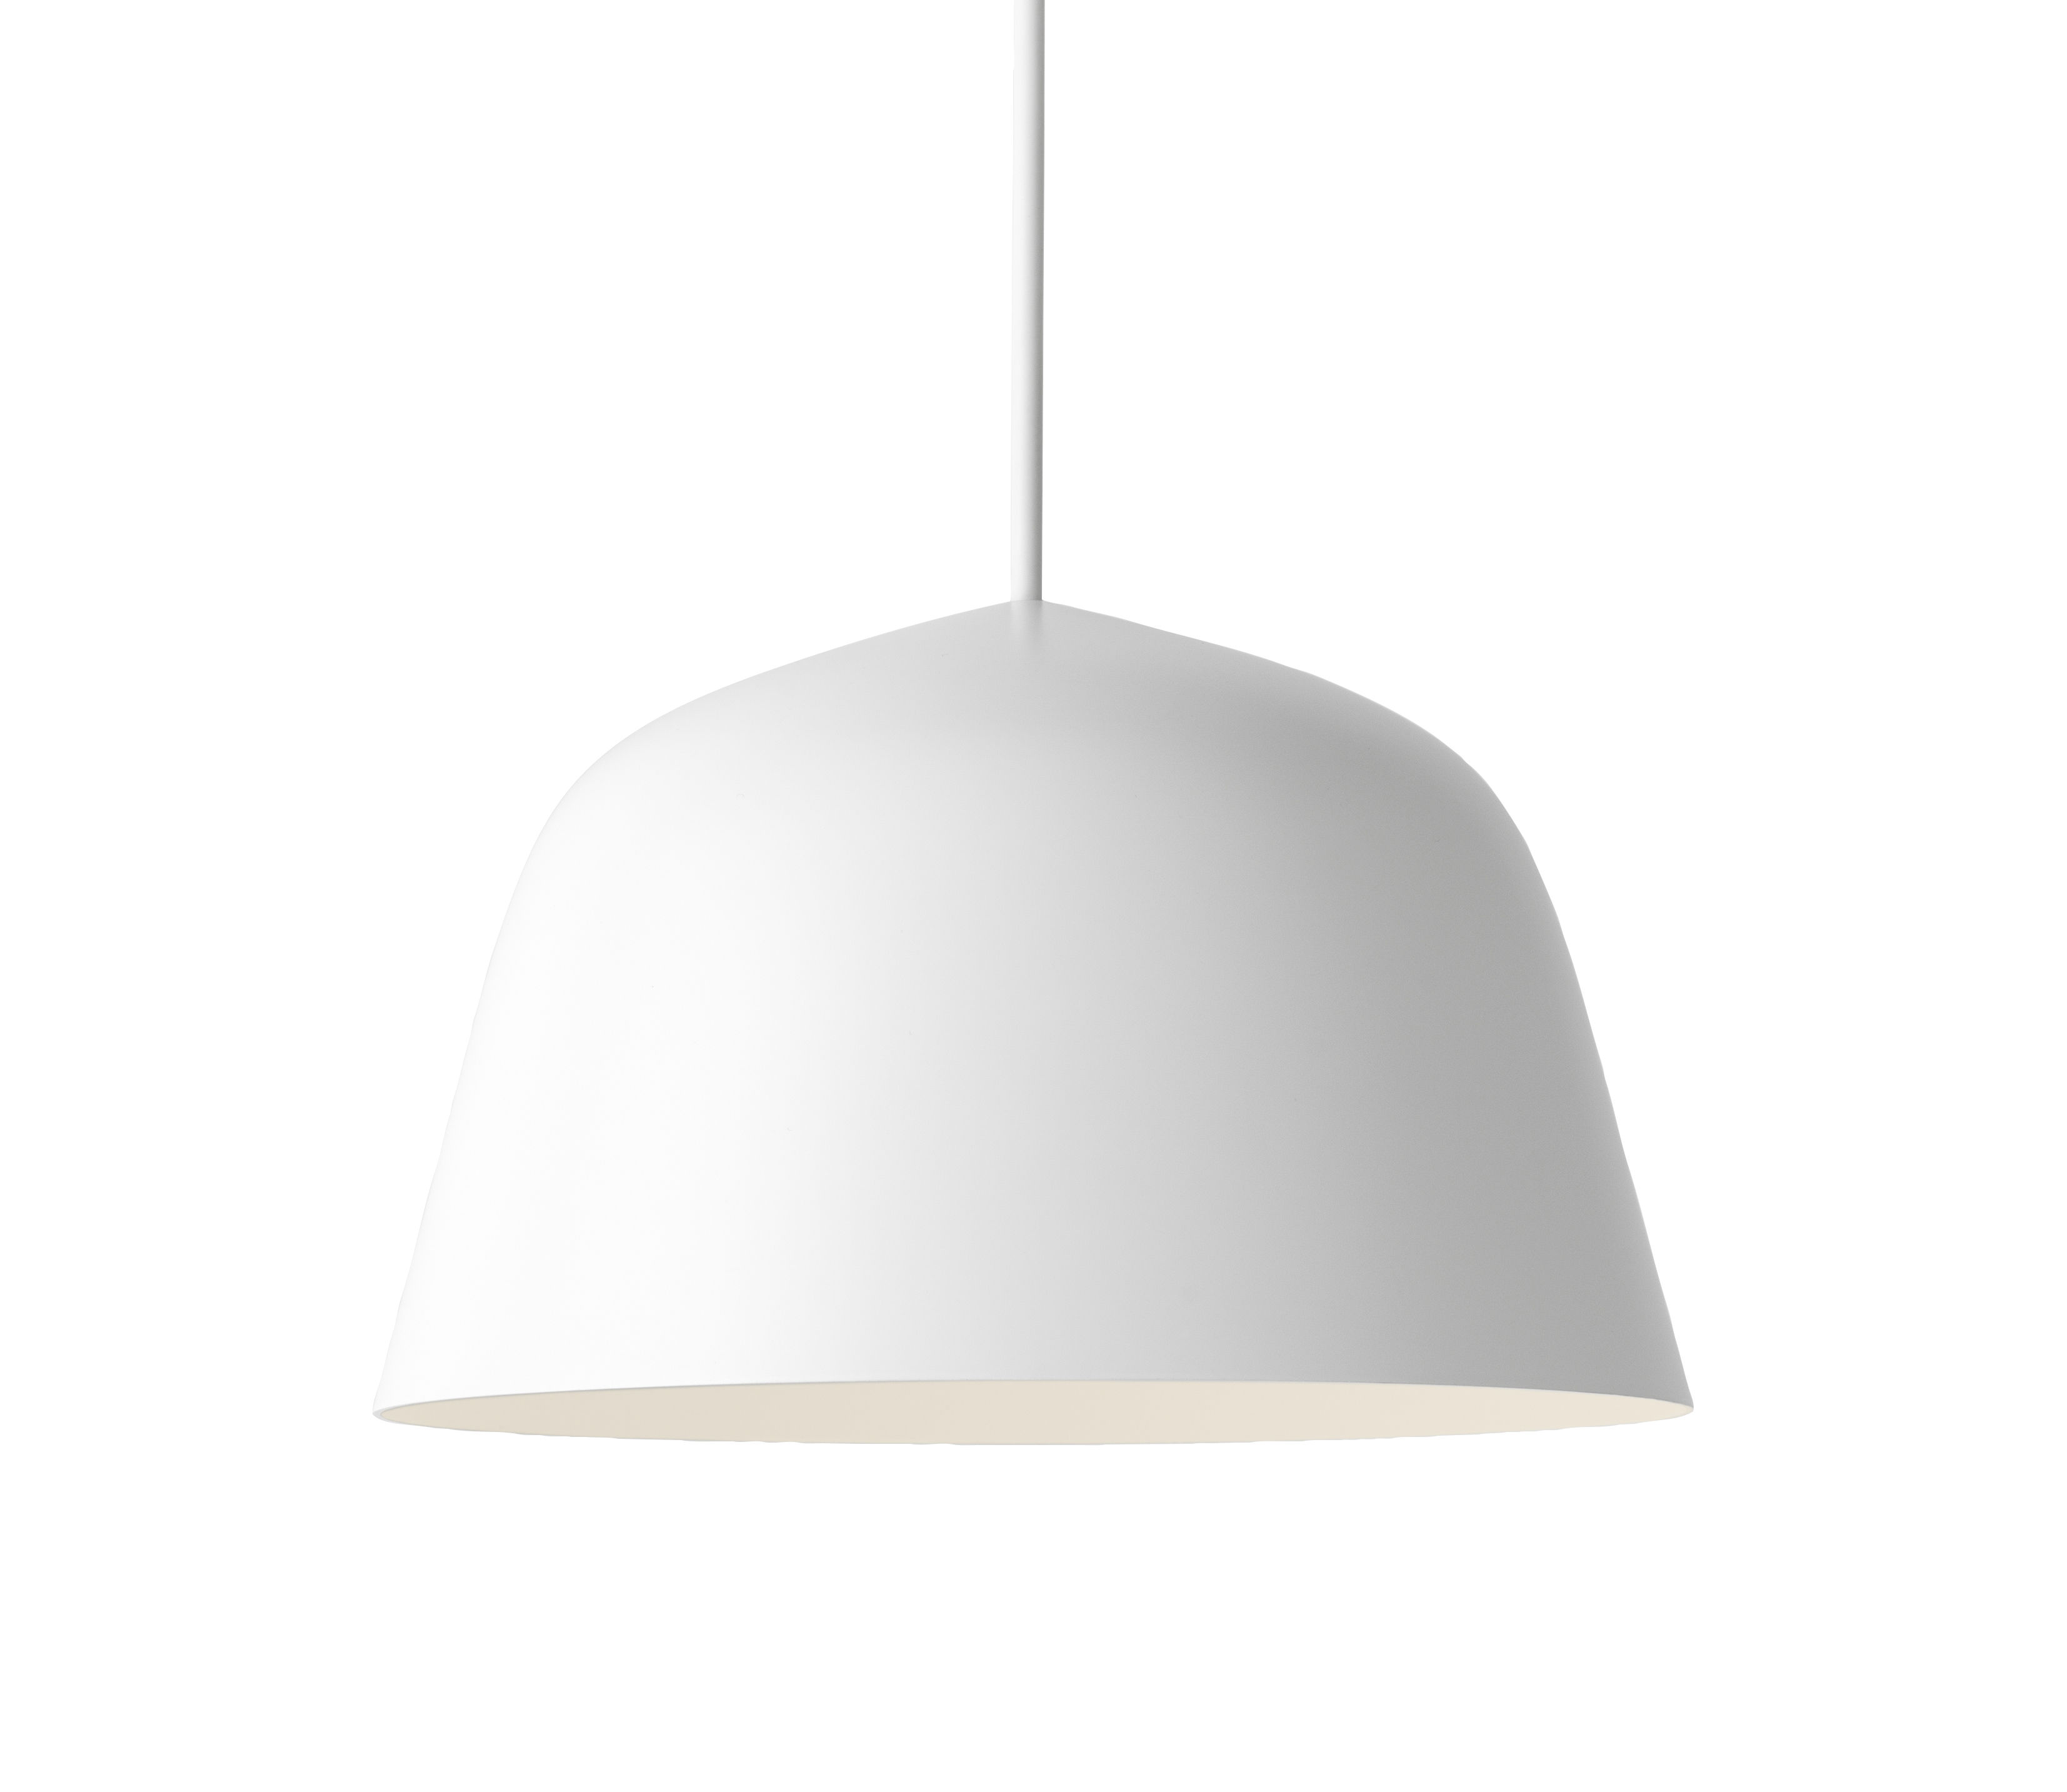 Illuminazione - Lampadari - Sospensione Ambit / Ø 25 cm - Metallo - Muuto - Blanc - Alluminio